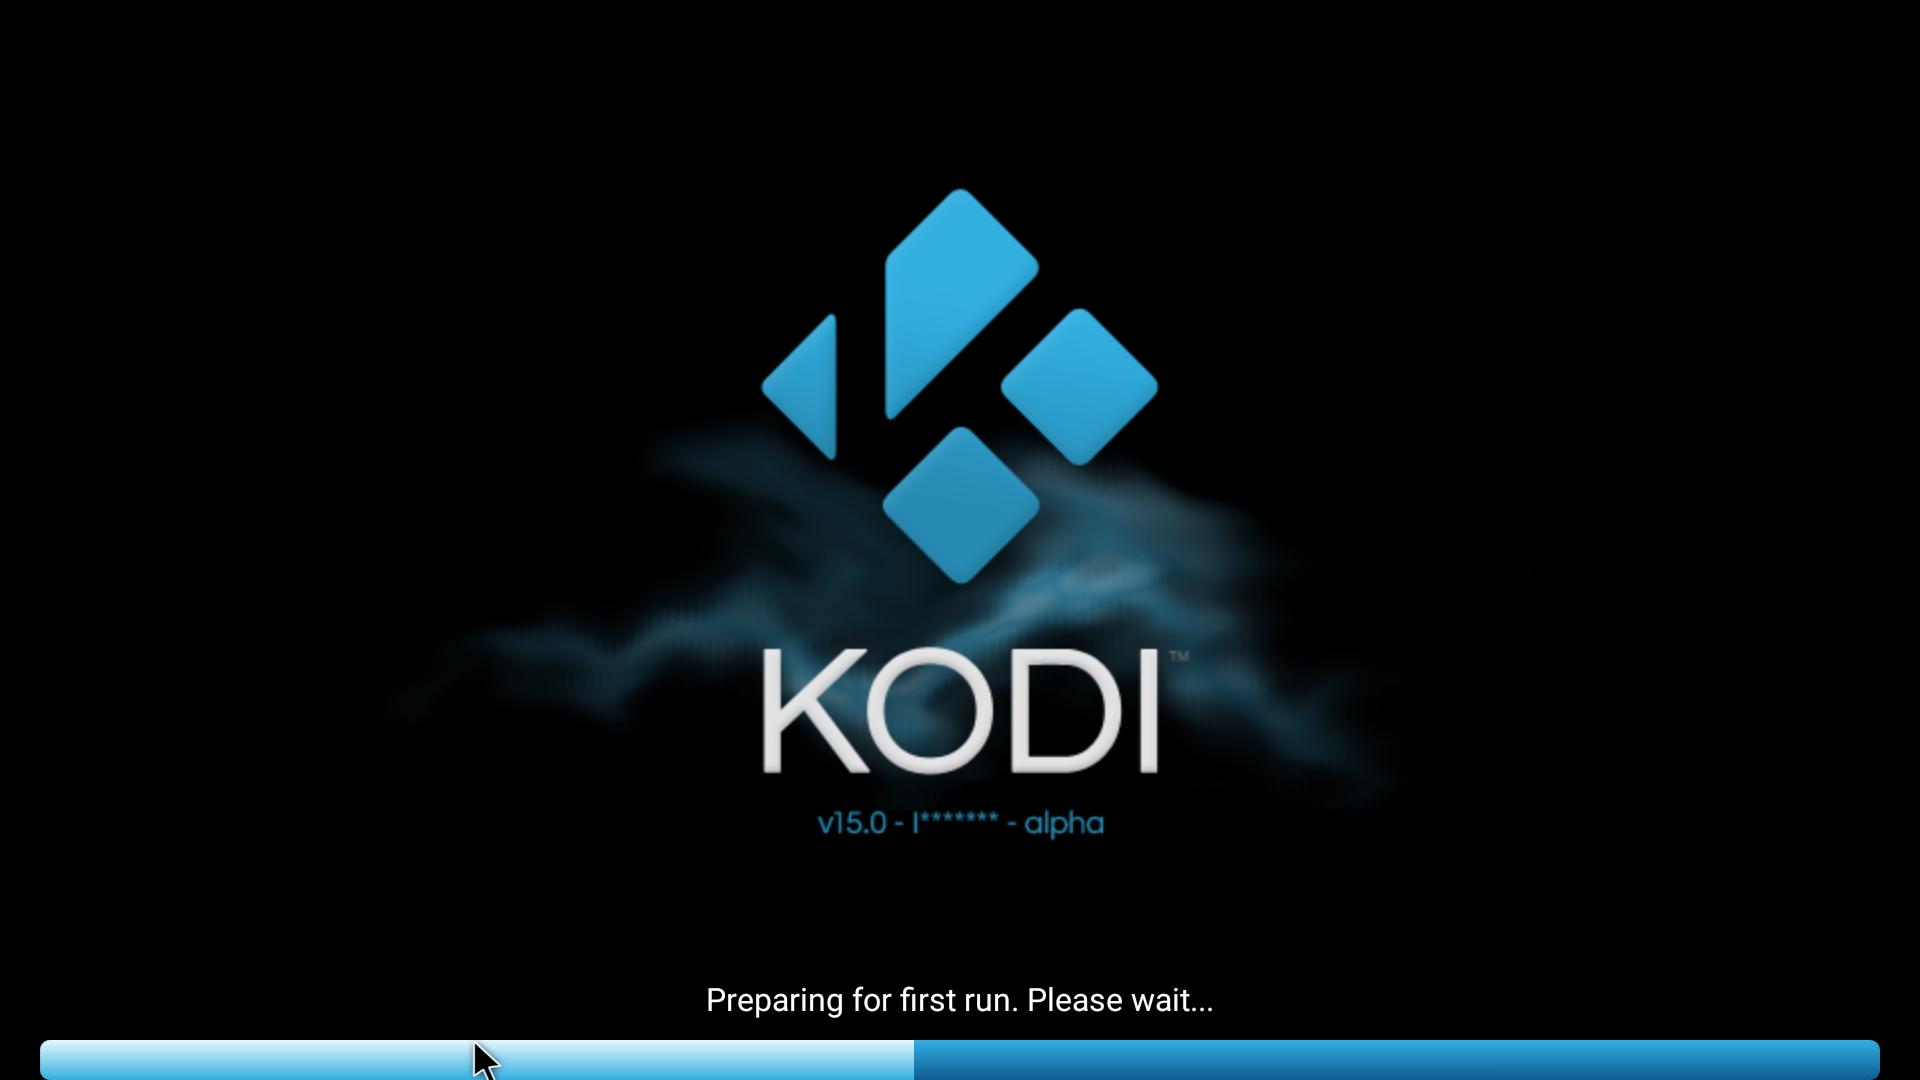 Kodi Background 1080p Wallpapers Wallpapersafari